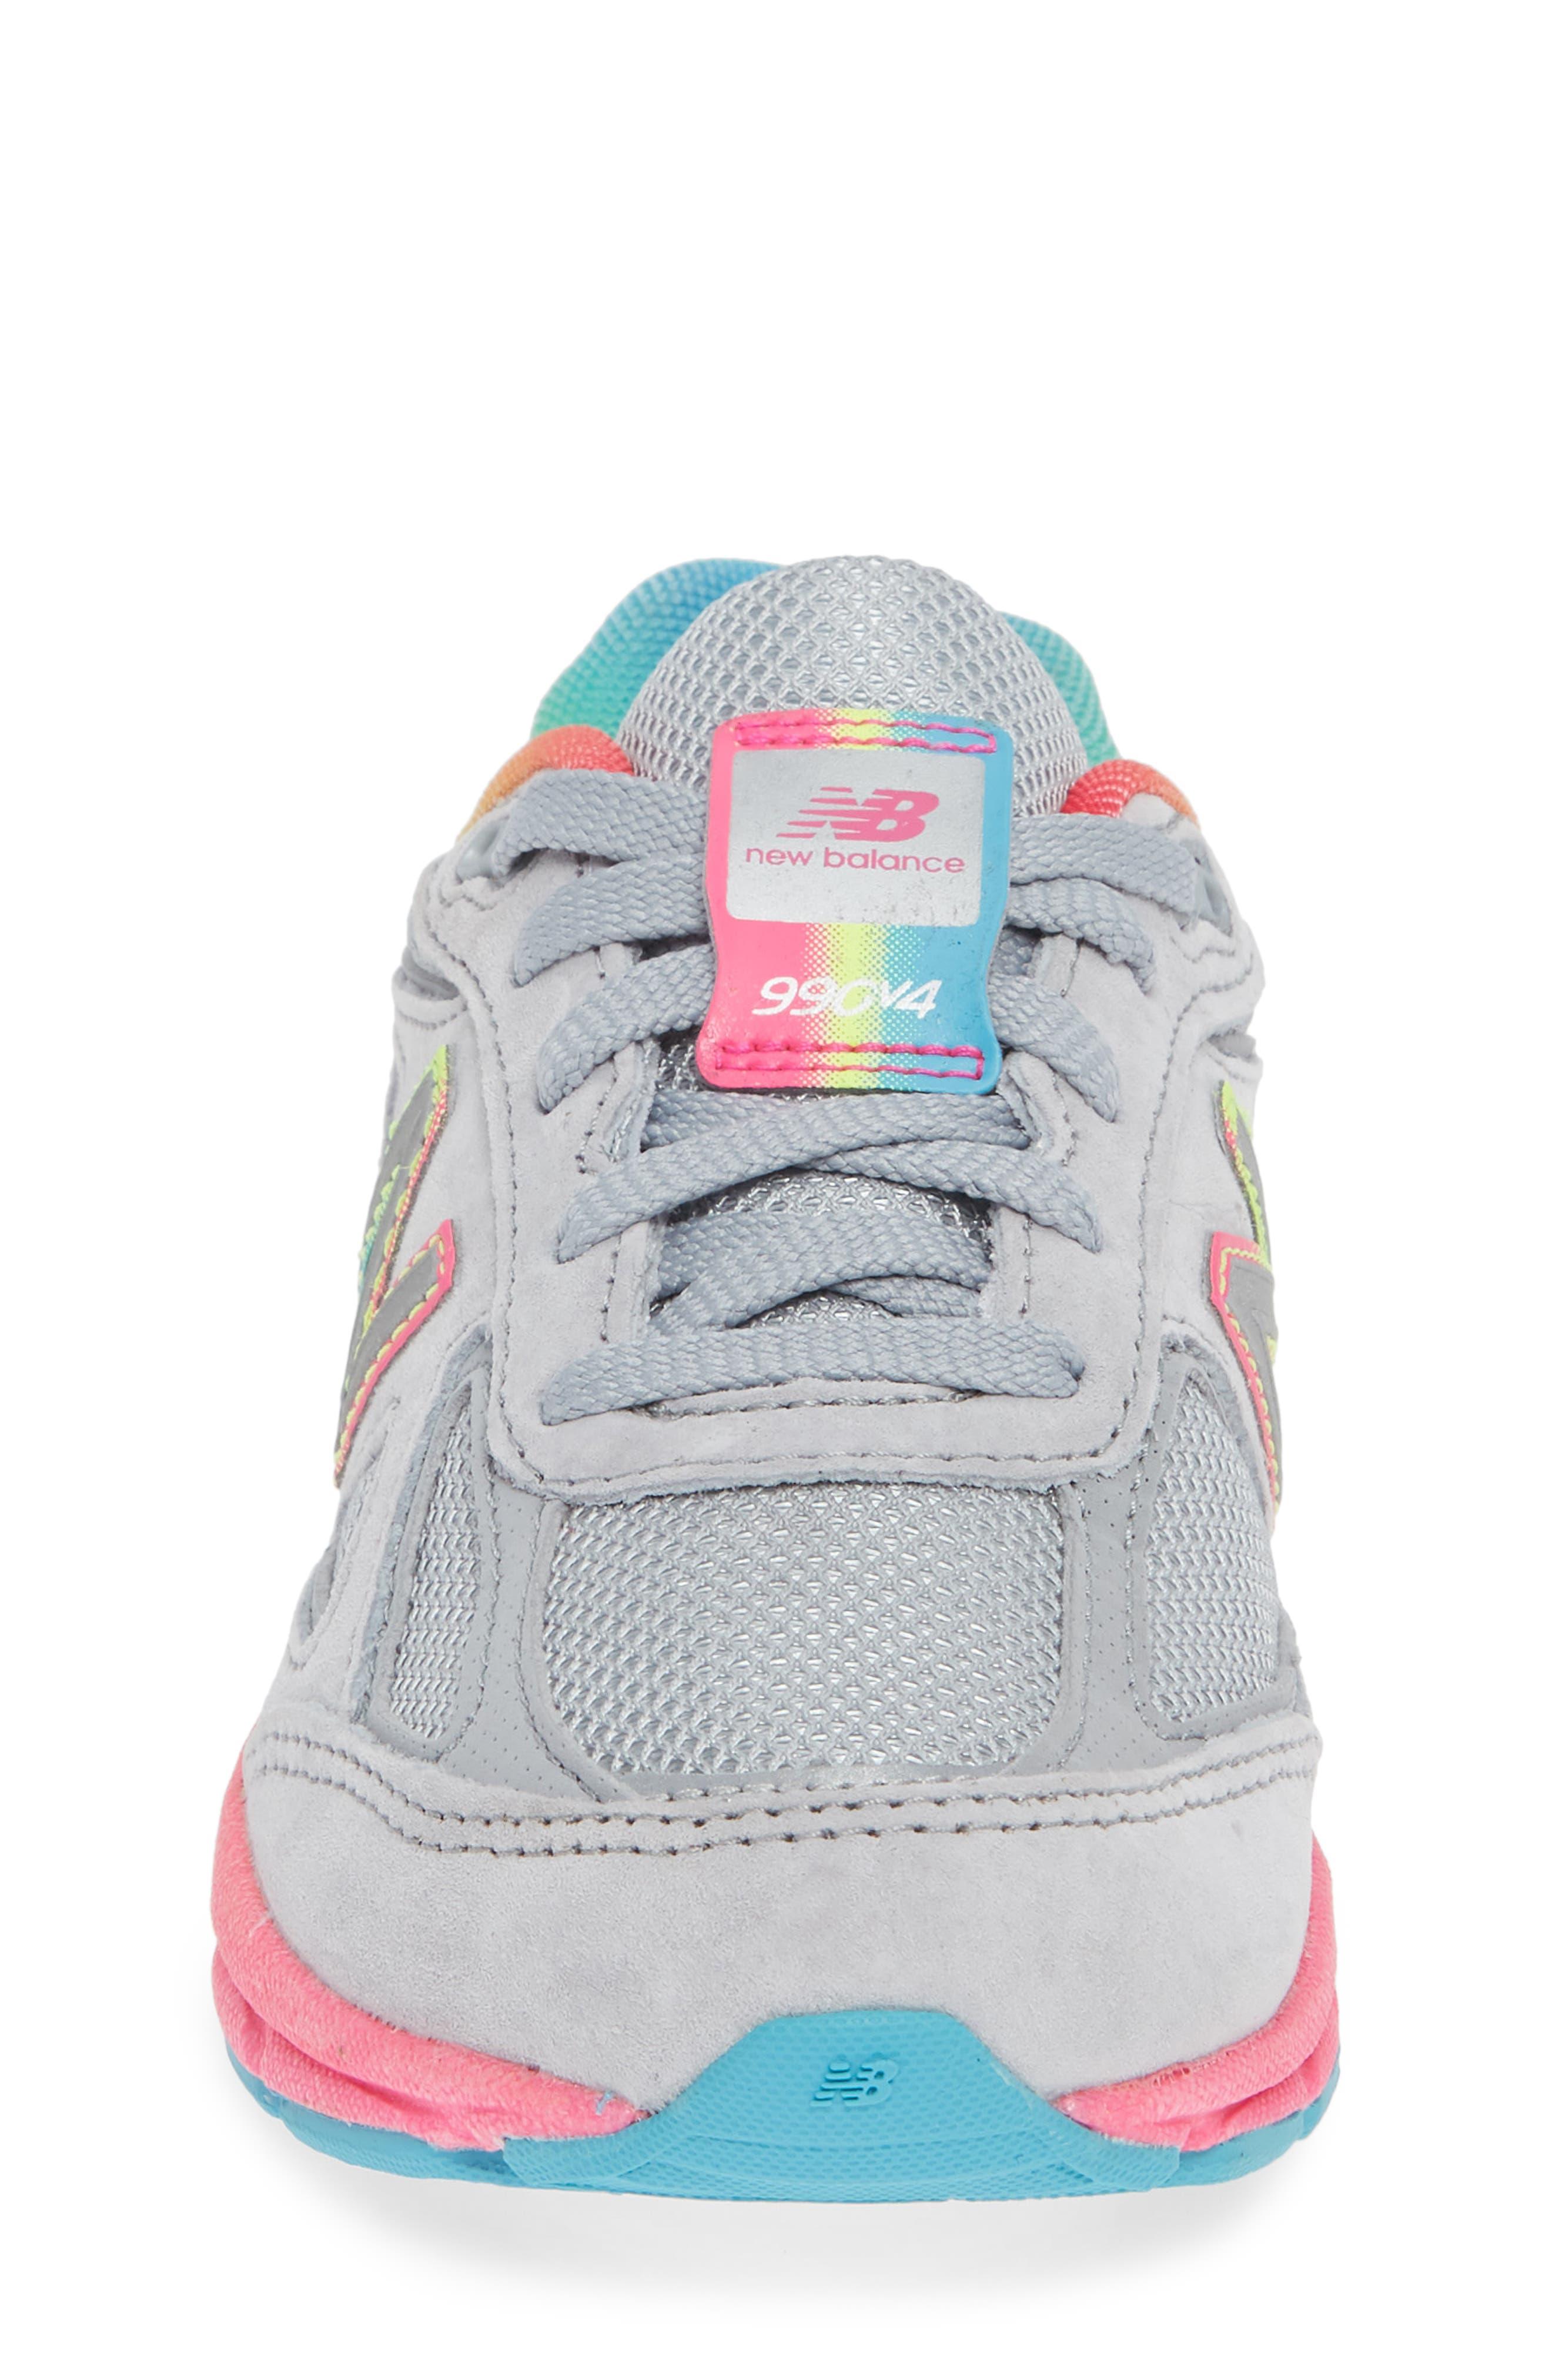 990v4 Sneaker,                             Alternate thumbnail 4, color,                             ATHLETIC GREY/ MULTI